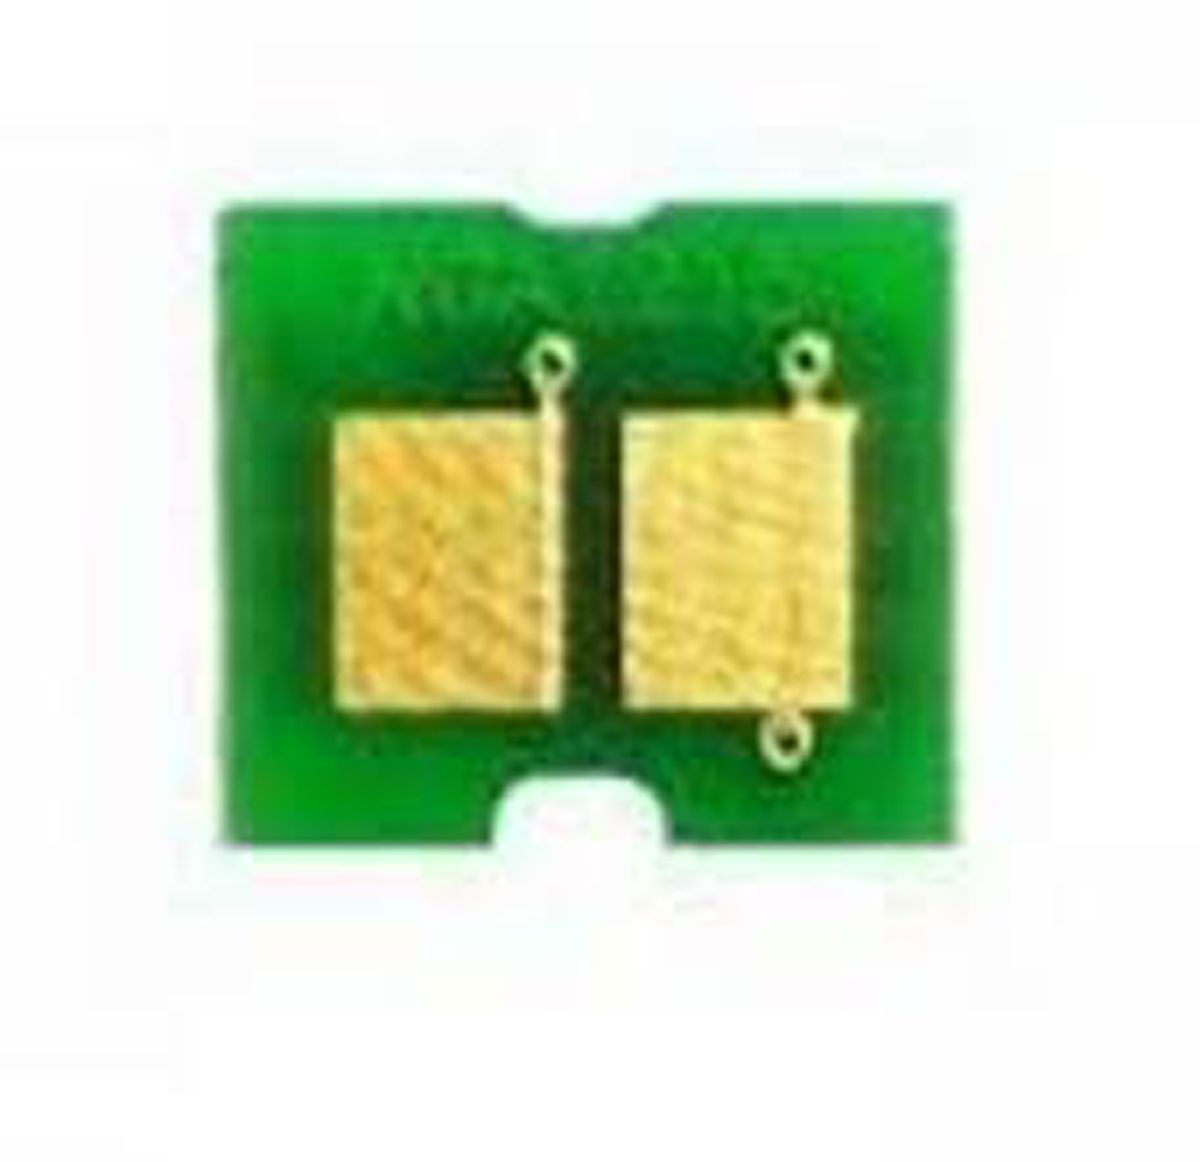 Chip HP CE320A CE320 320A 128A - CM1415 CM1415FNW CP1525 - Preto - 2K